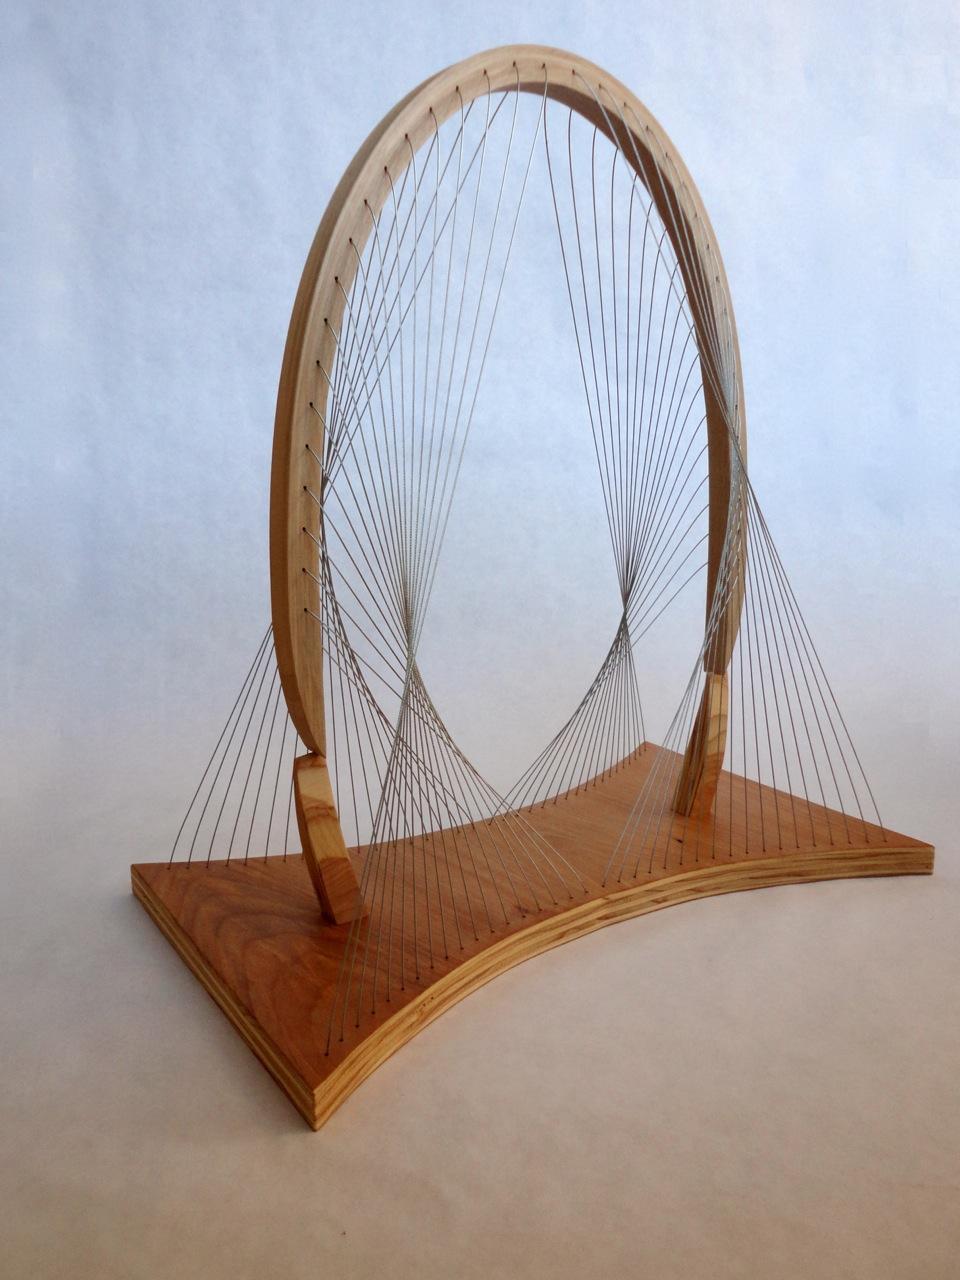 The original Balanced Arch sculpture